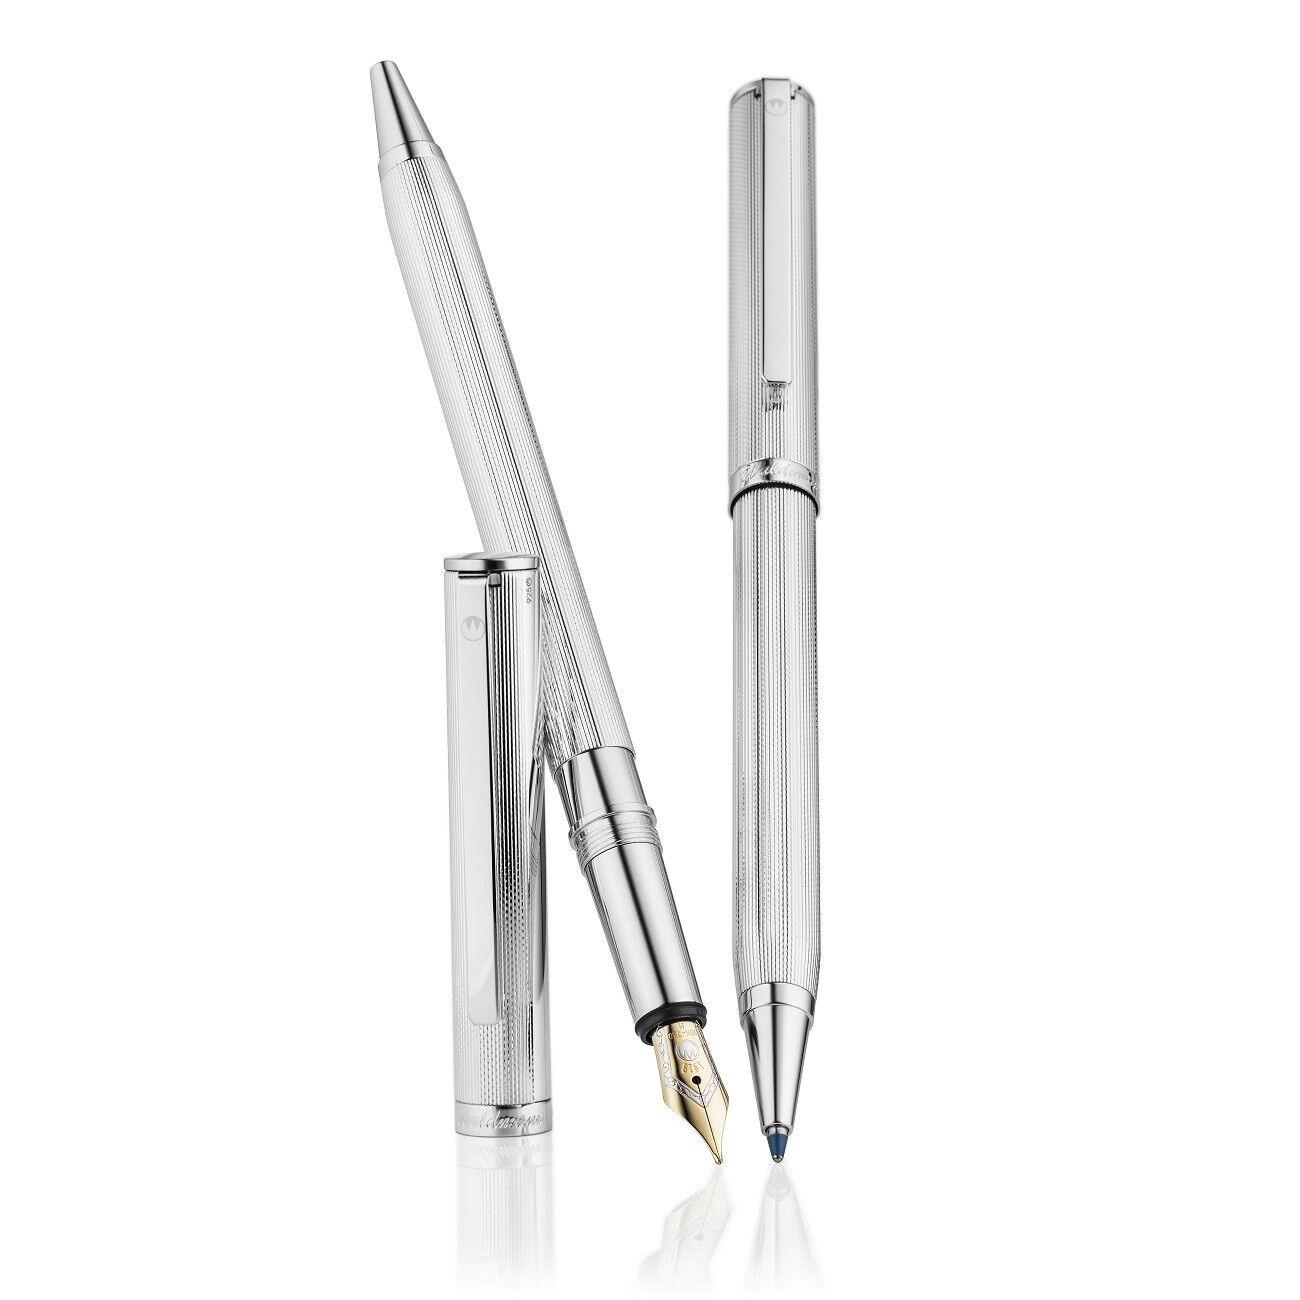 Waldmann Pen,Sterling Pen,Sterling Pen,Sterling Silber,Two in One,Sonderotition,Füller&Kugelschreiber | Online-Exportgeschäft  6fe2ff